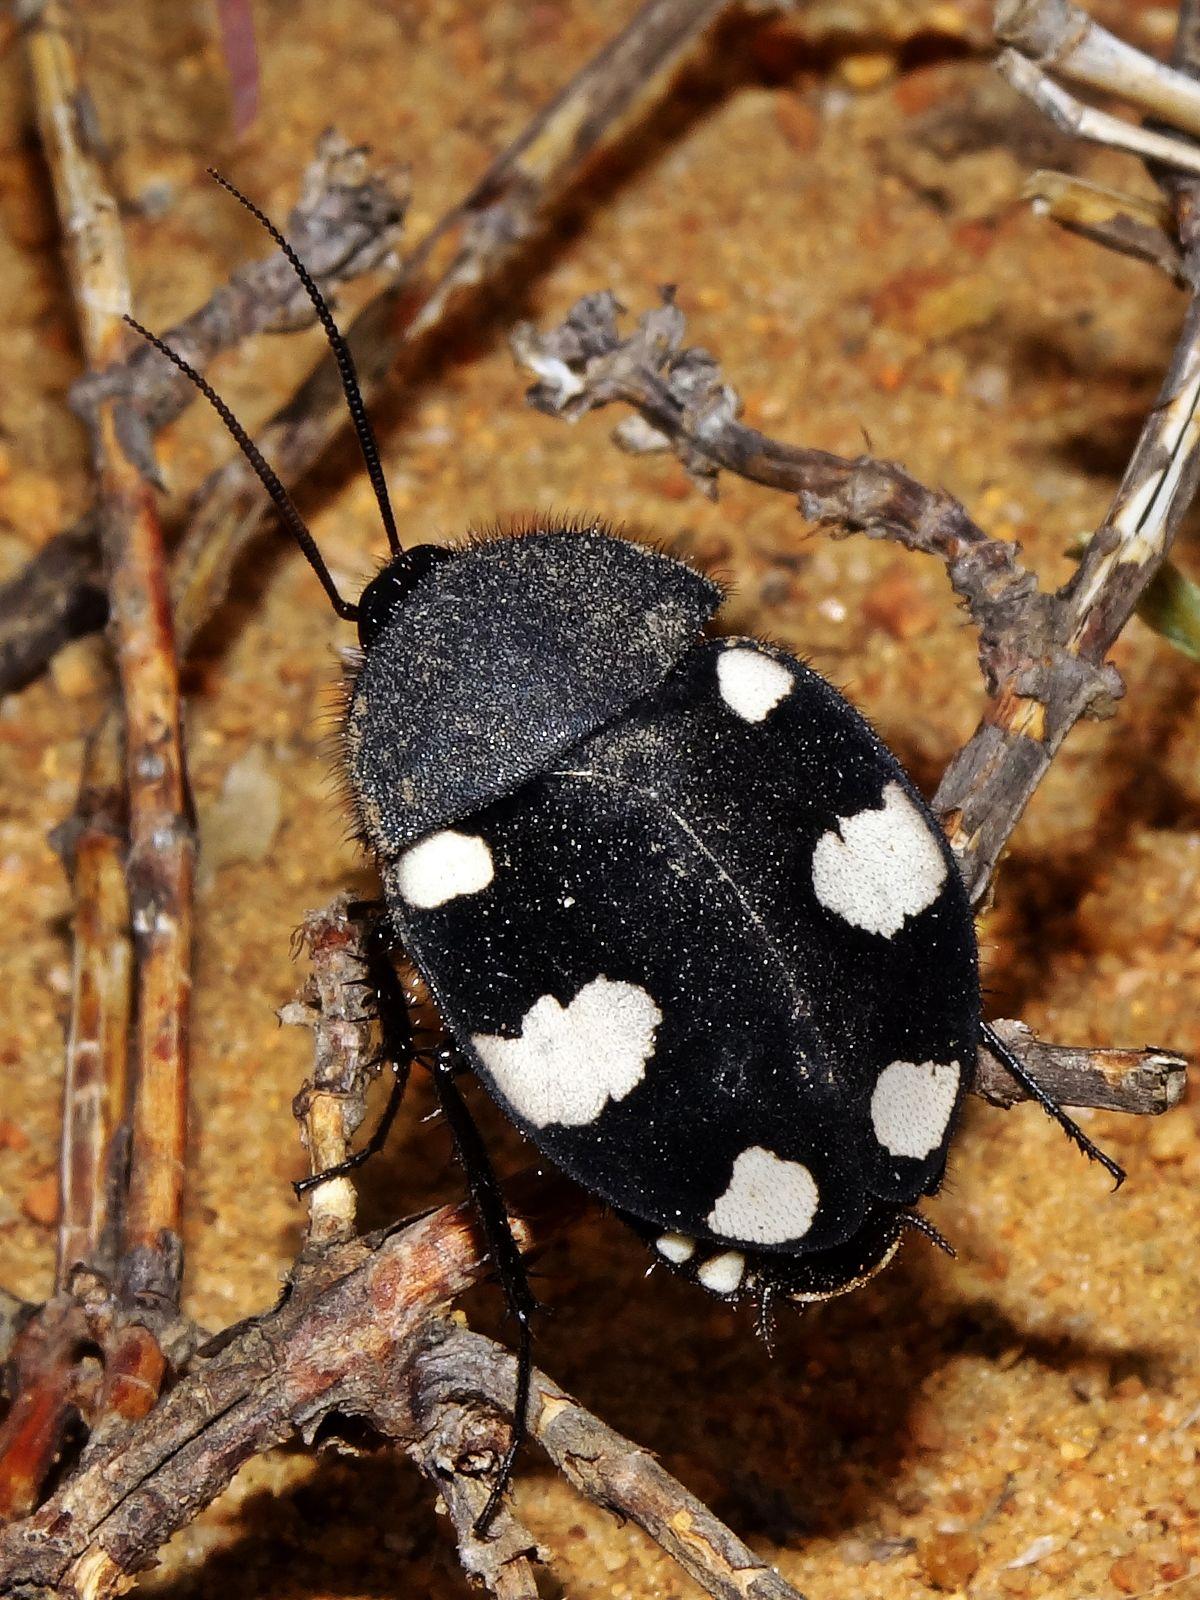 Blattodea - Wikipedia